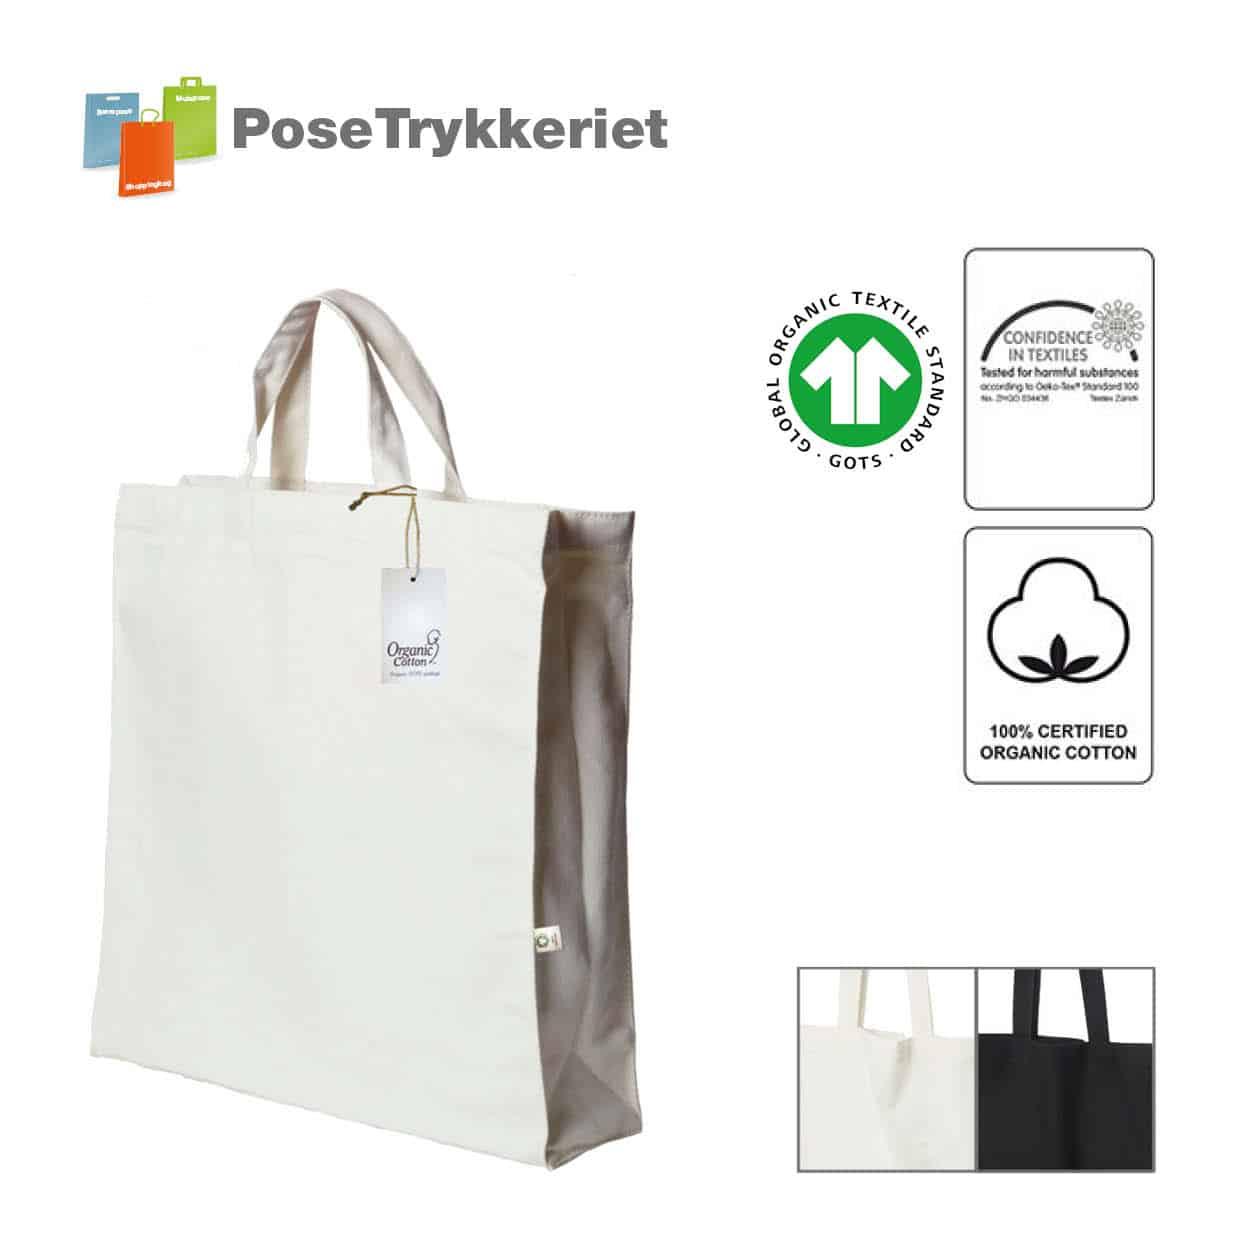 Miljøvenlig bomulspose i kraftig kanvas, str. 38 x 42cm med korte hanke. Posetrykkeriet.dk